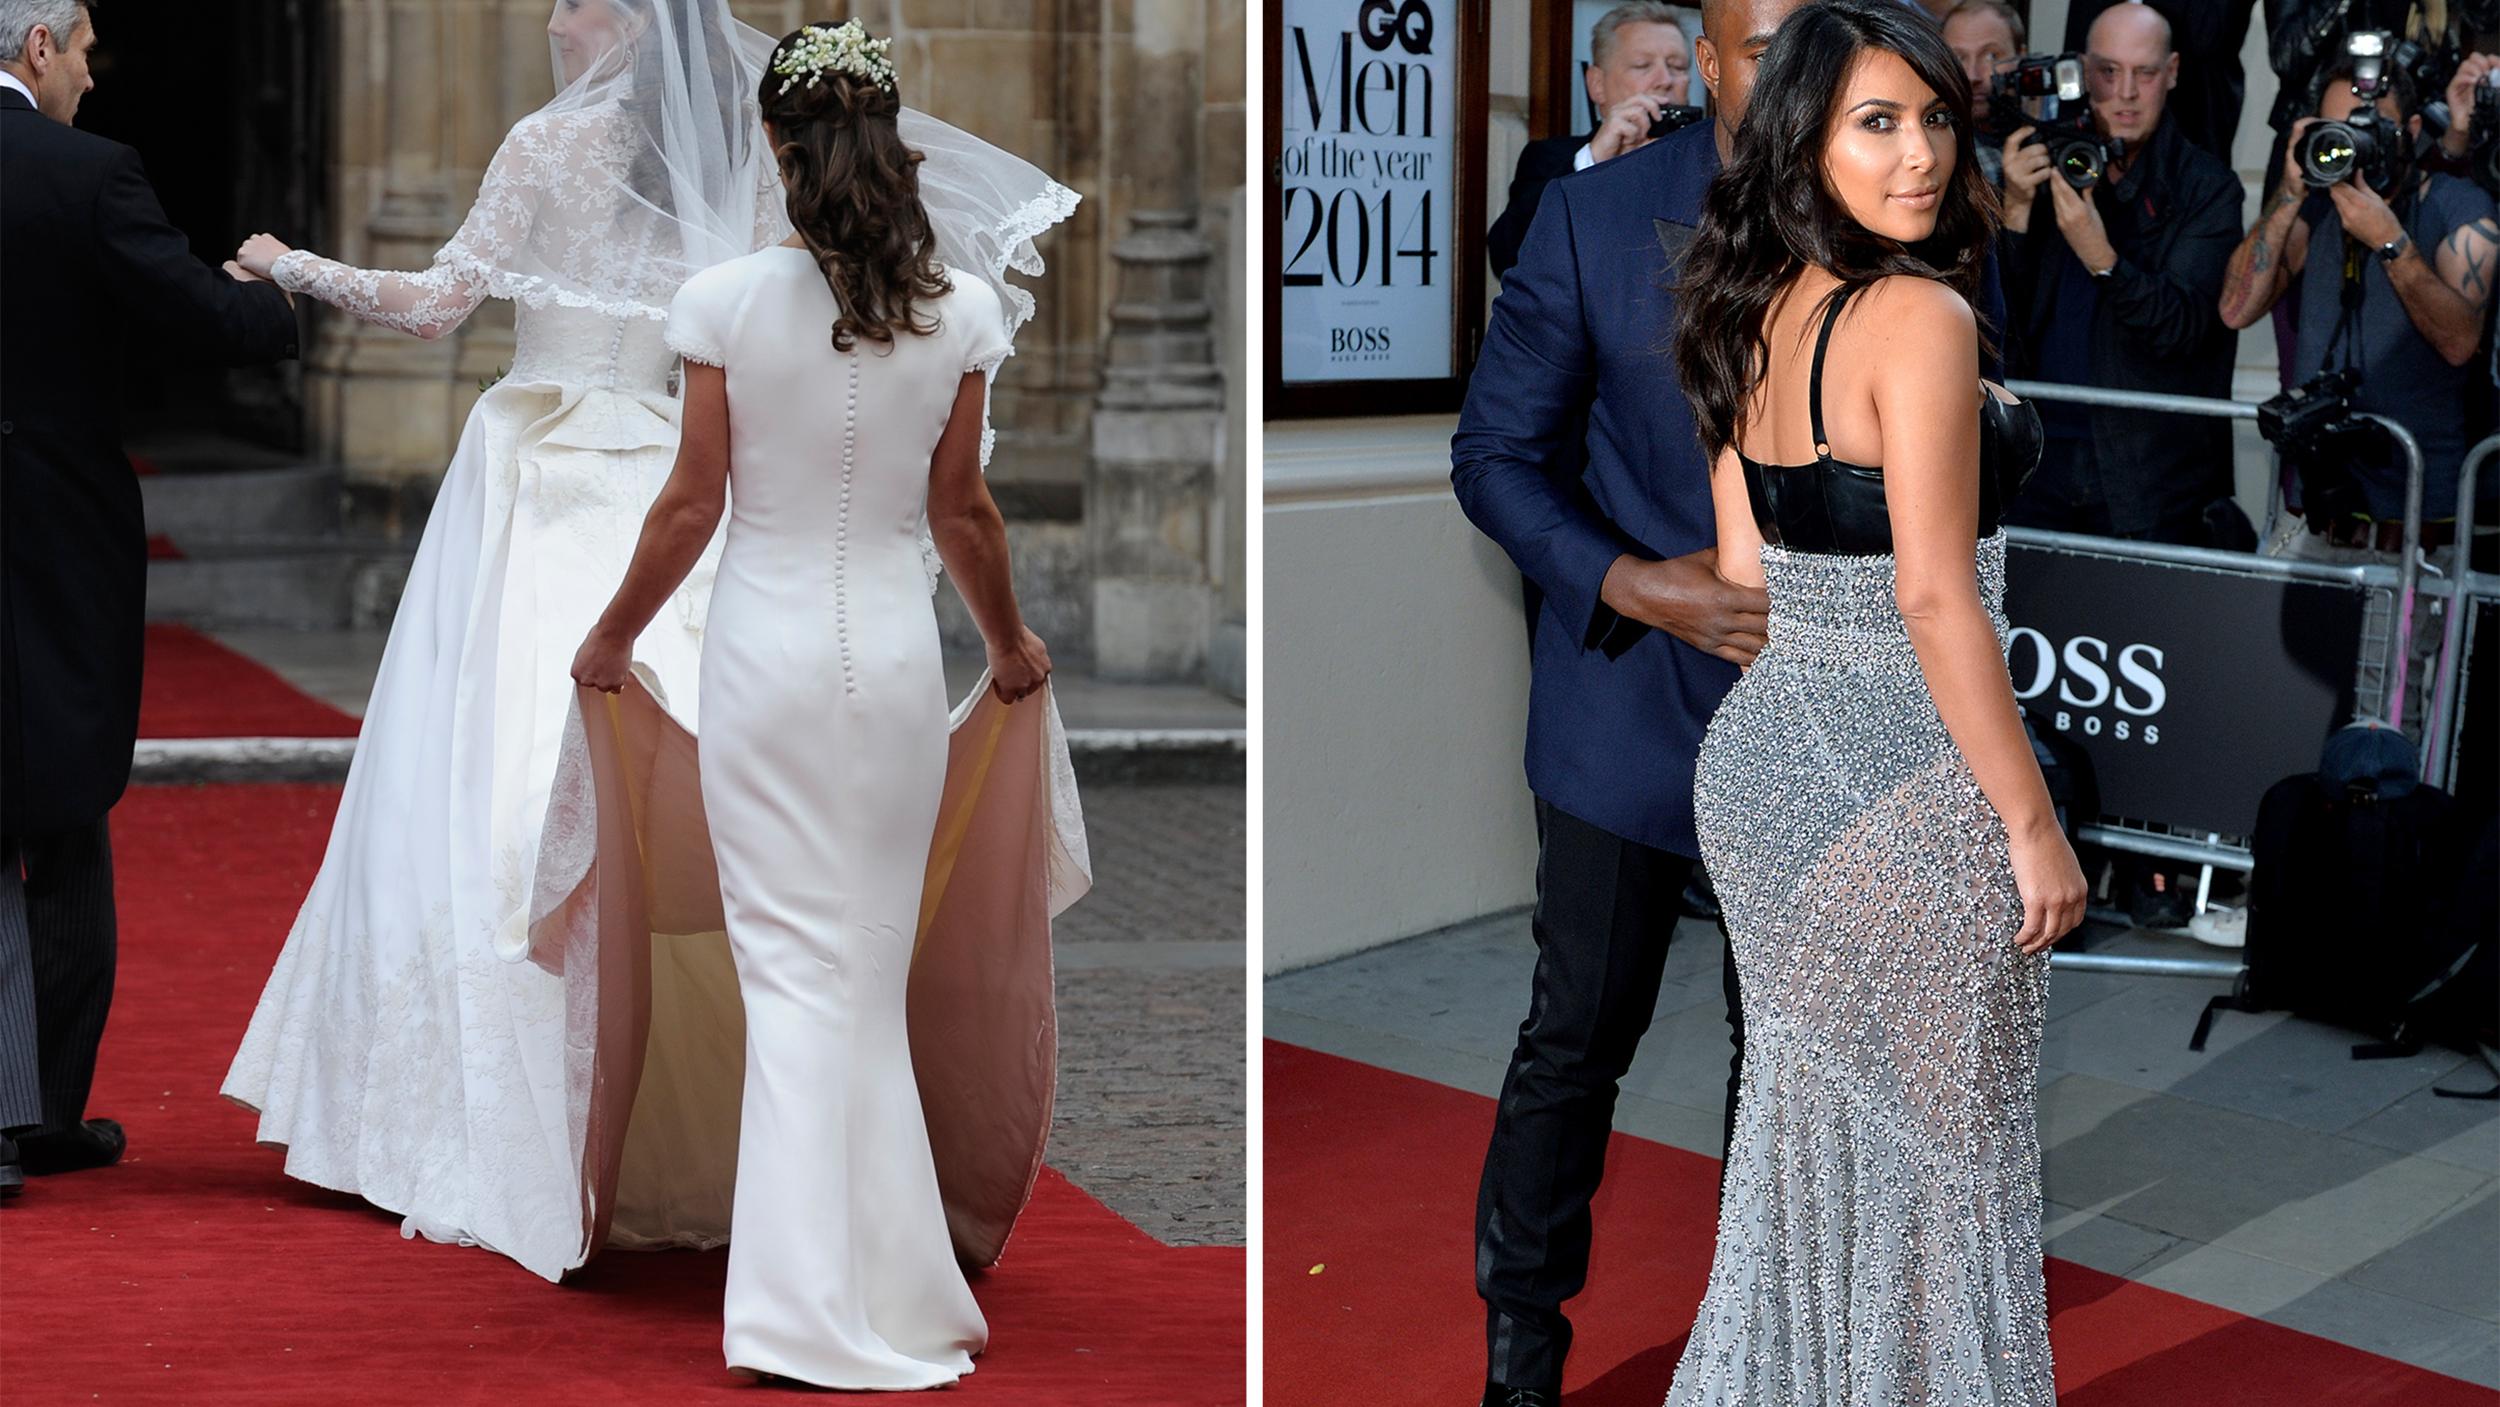 Pippa Middleton Declares Kim Kardashian The Rear Of 2014